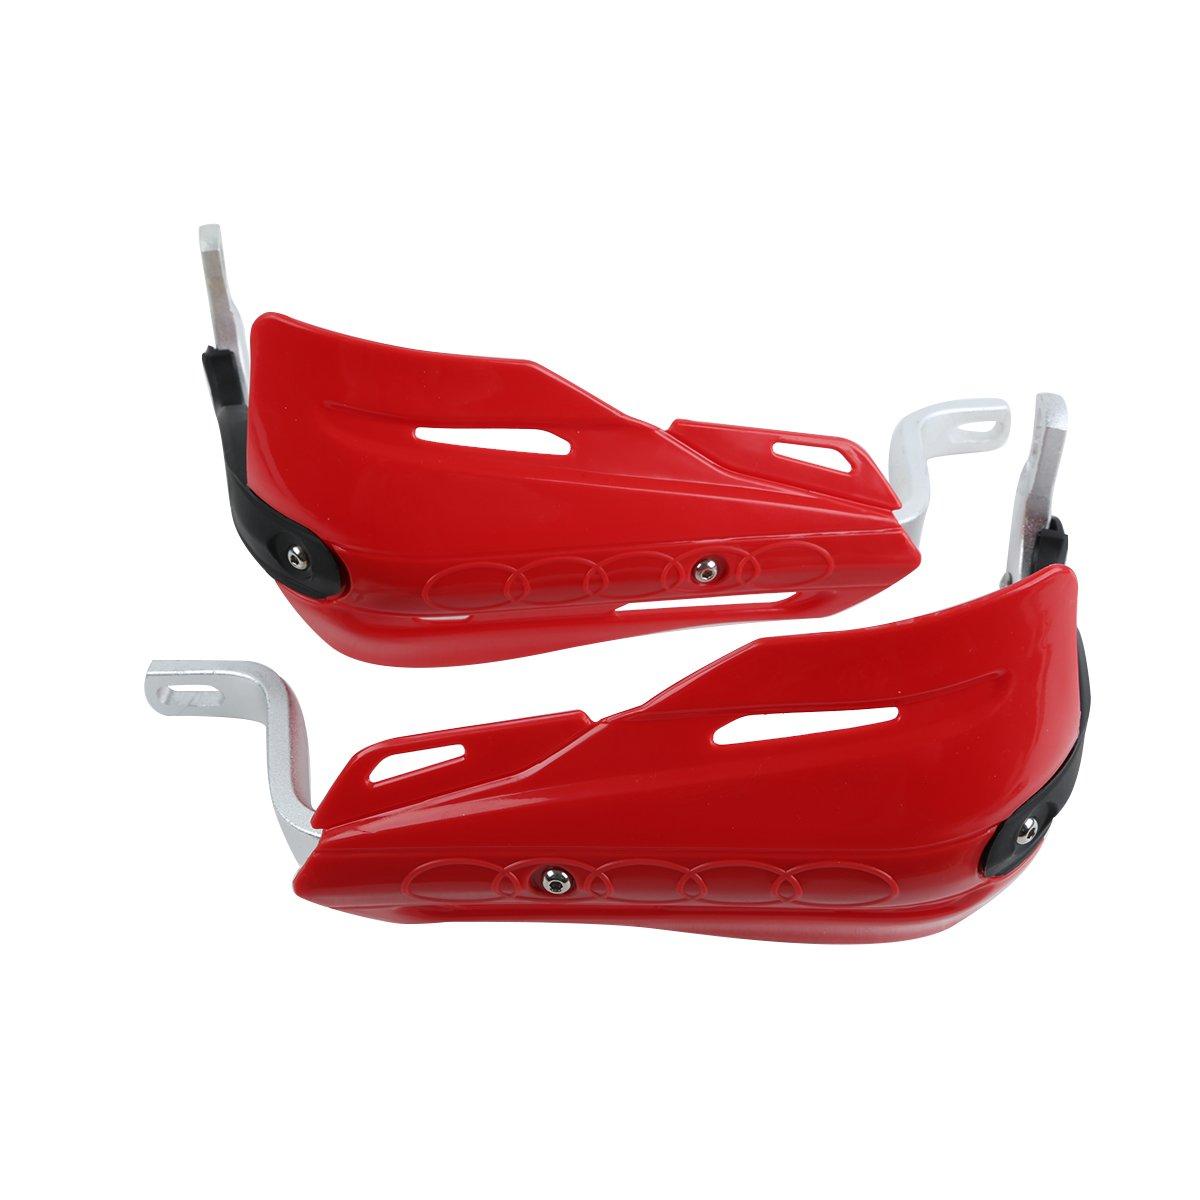 Dirt bikes,MX bikes and ATVs. XMT-MOTO 7//8 Handguards Hand Guards For Honda Yamaha Kawasaki Suzuki